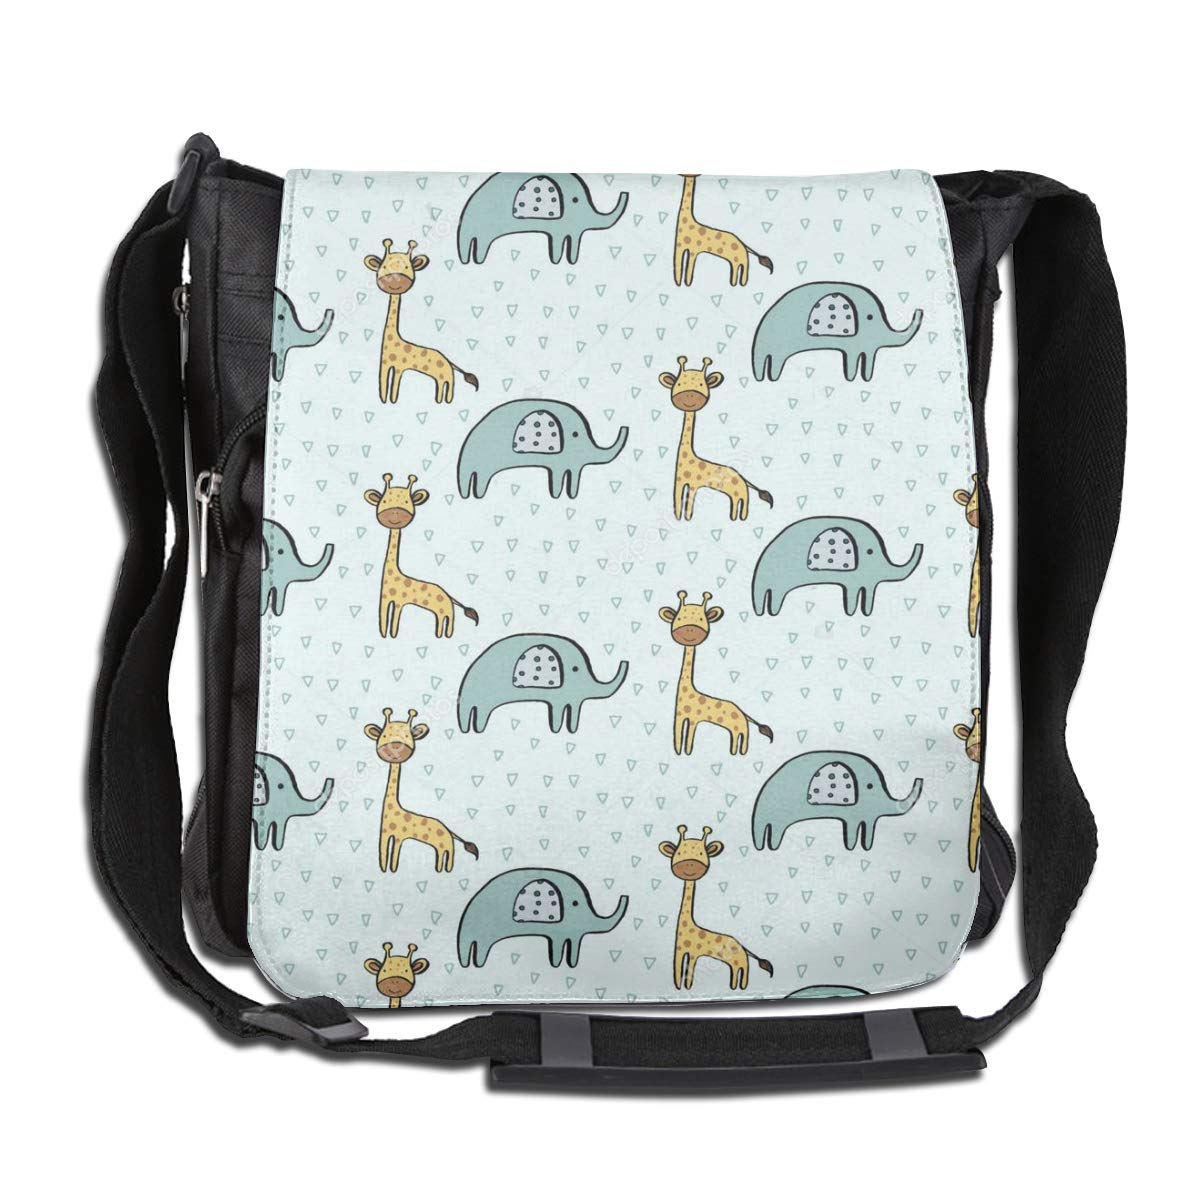 Giraffe and Elephant Fashion Diagonal Single Shoulder Workout Bag